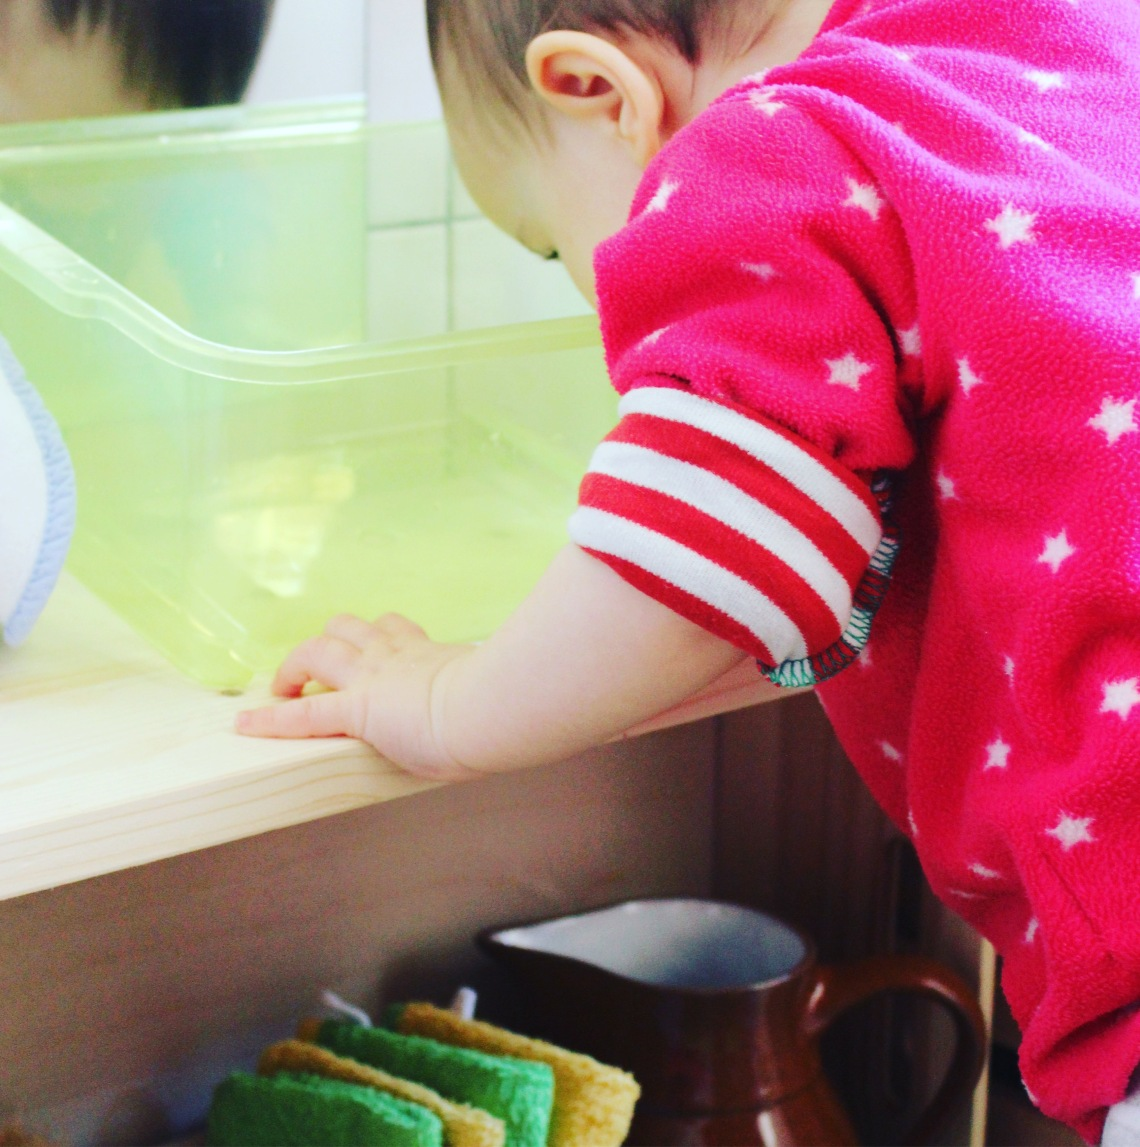 Baño Montessori Mamá extraterrestre estación lavado manos aseo espacios reducidos